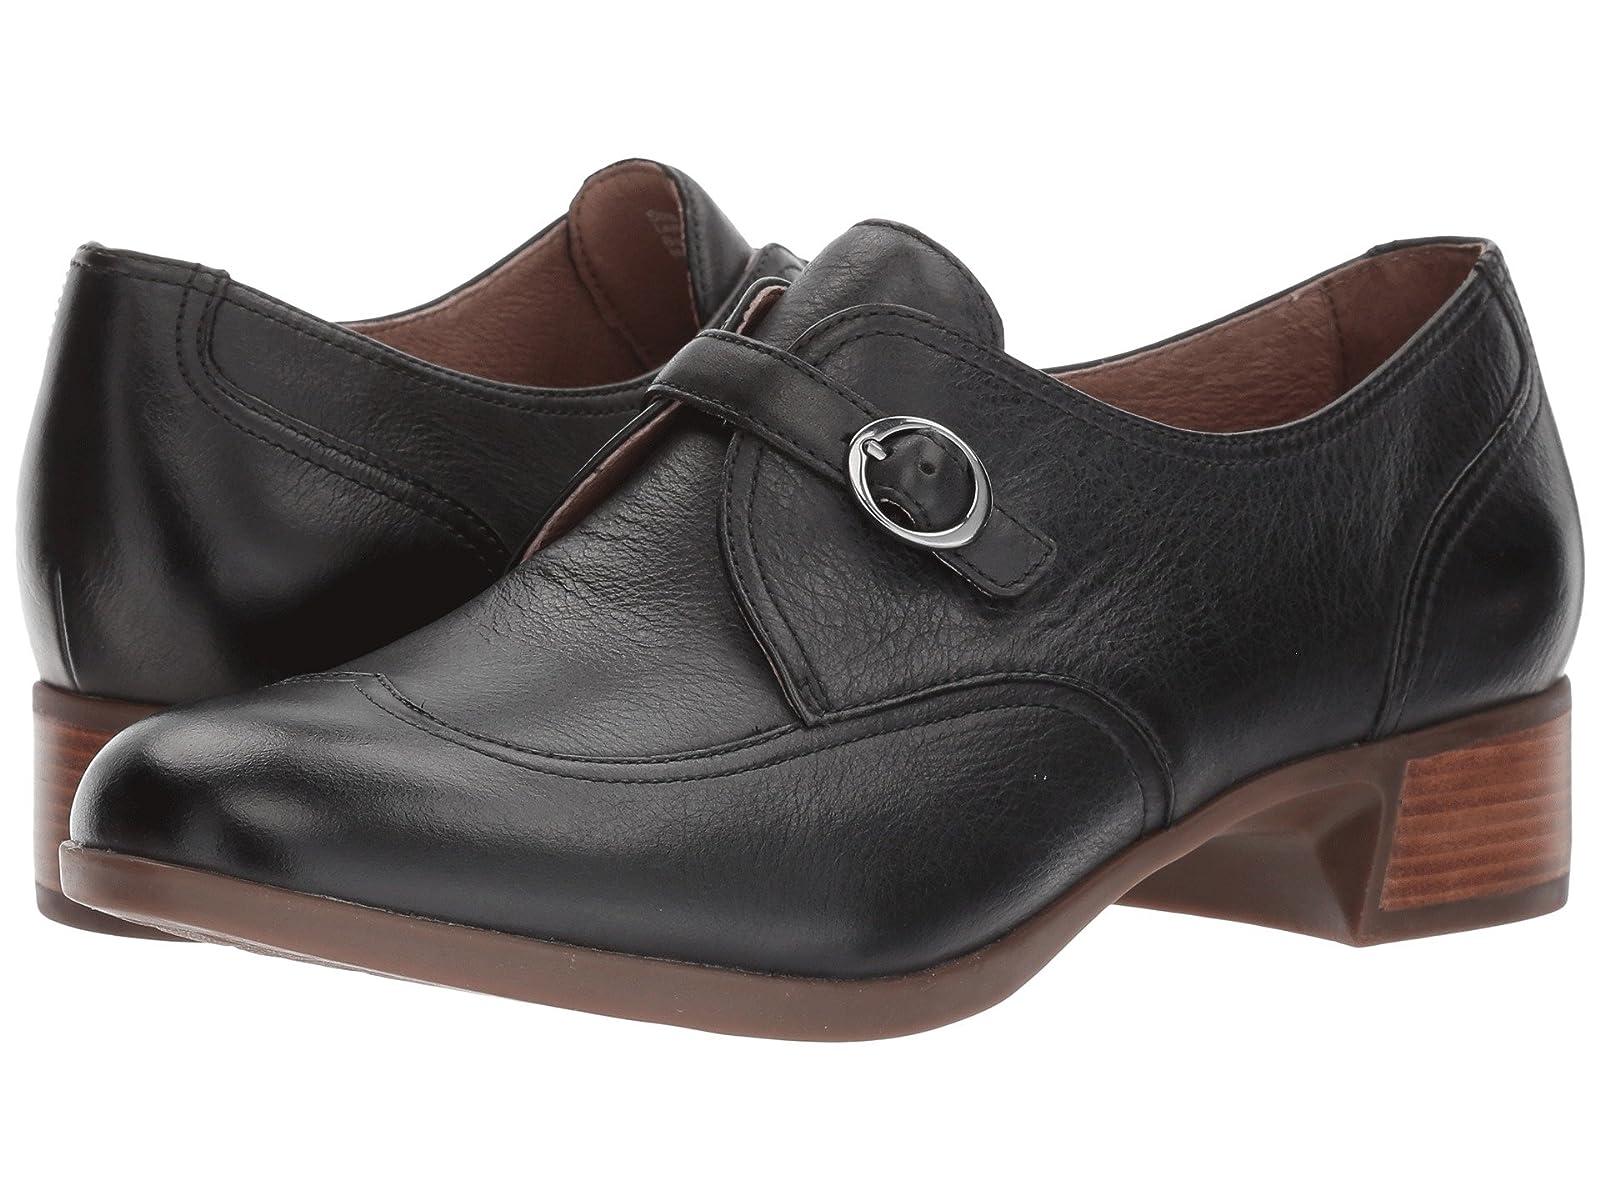 Dansko LivieCheap and distinctive eye-catching shoes